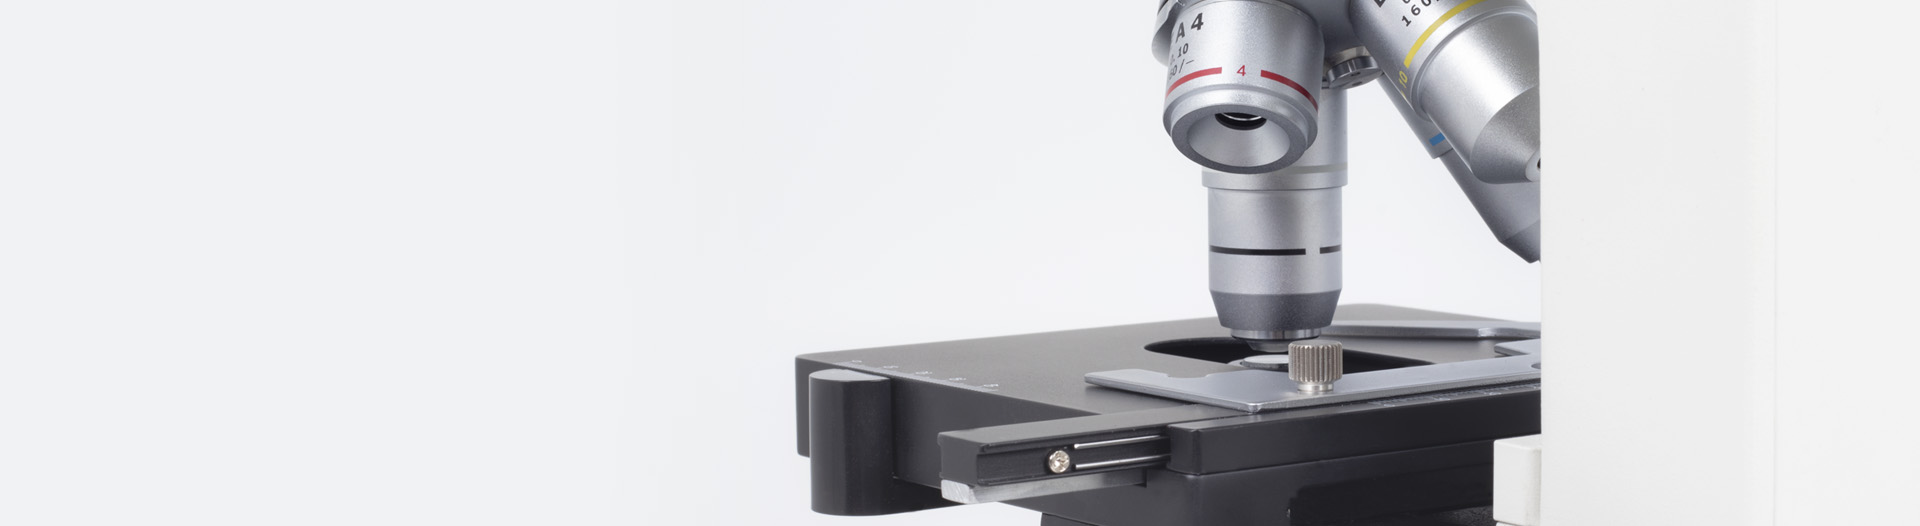 ECOLINE microscope Mechanics